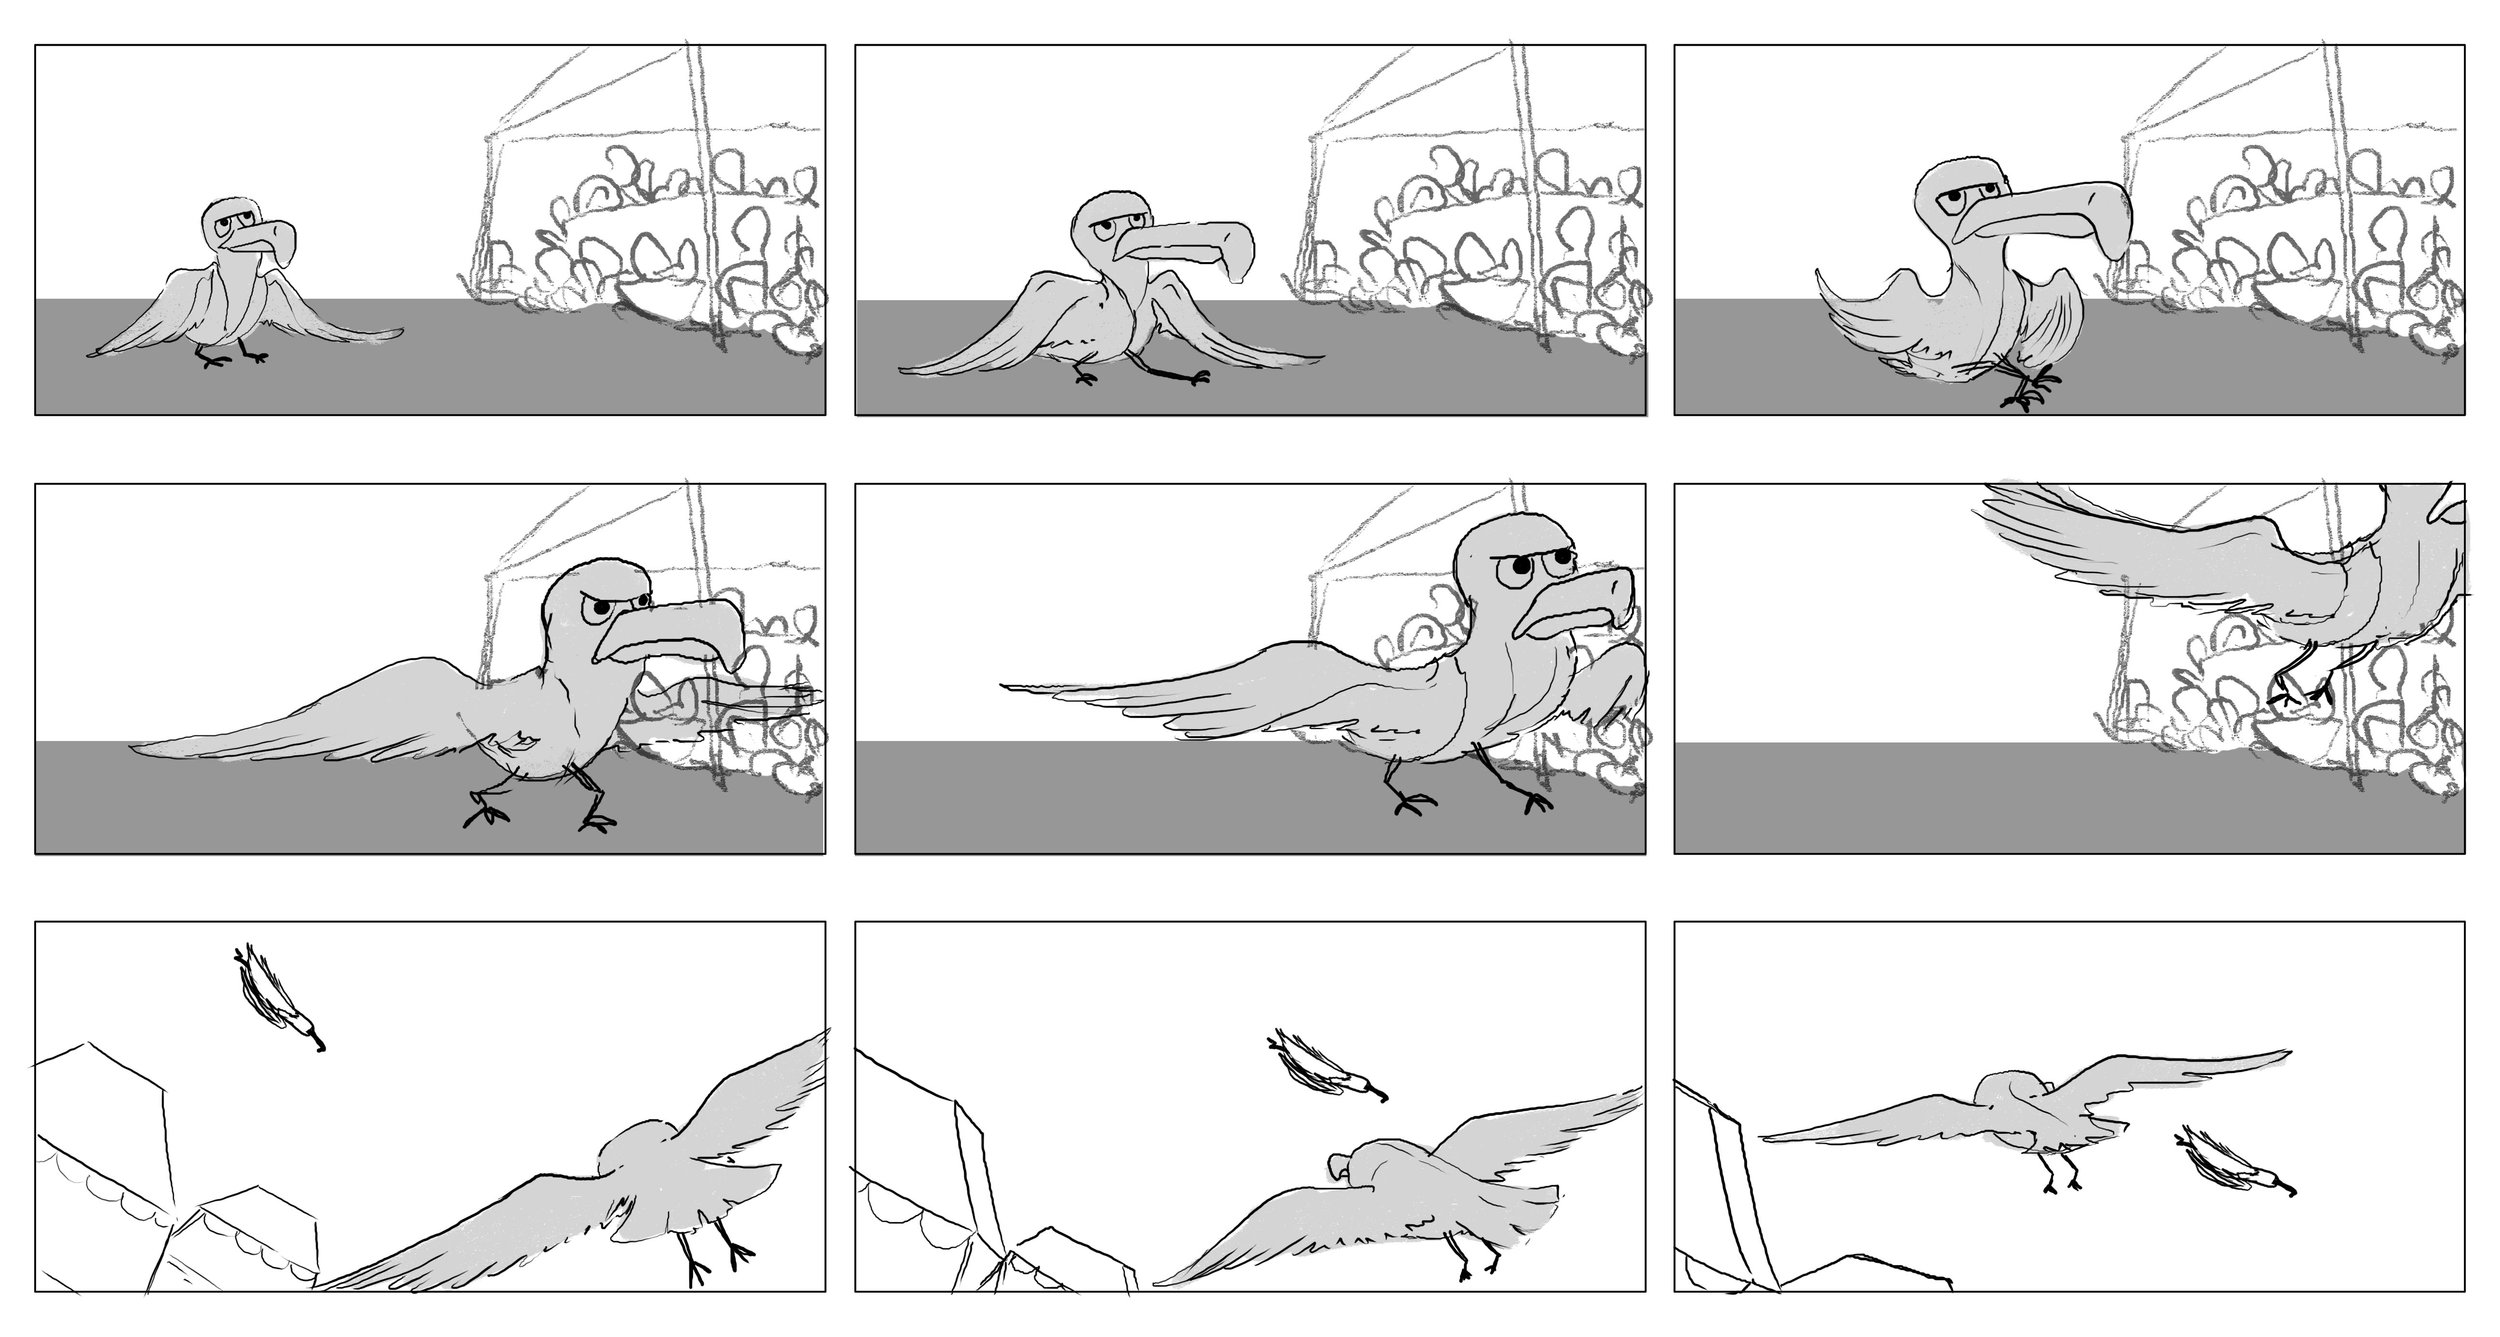 seaguls-11.jpg